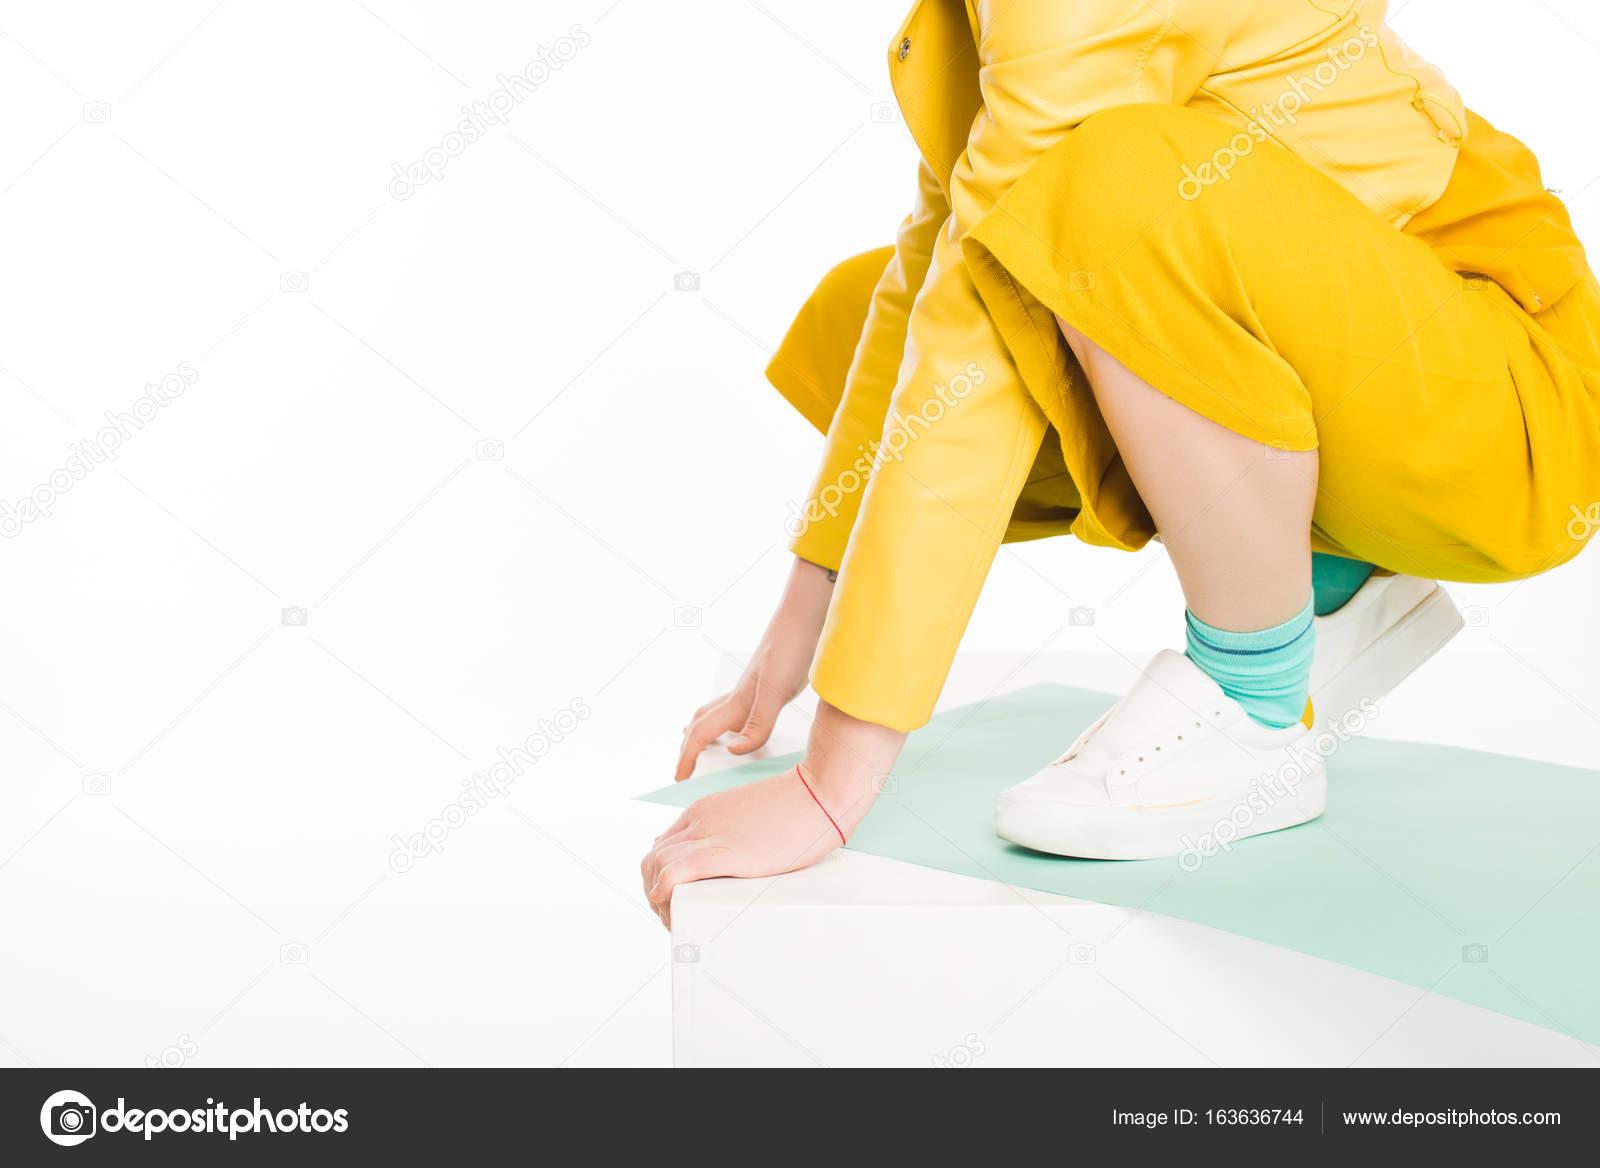 fille la mode dans les v tements jaunes photographie igorvetushko 163636744. Black Bedroom Furniture Sets. Home Design Ideas